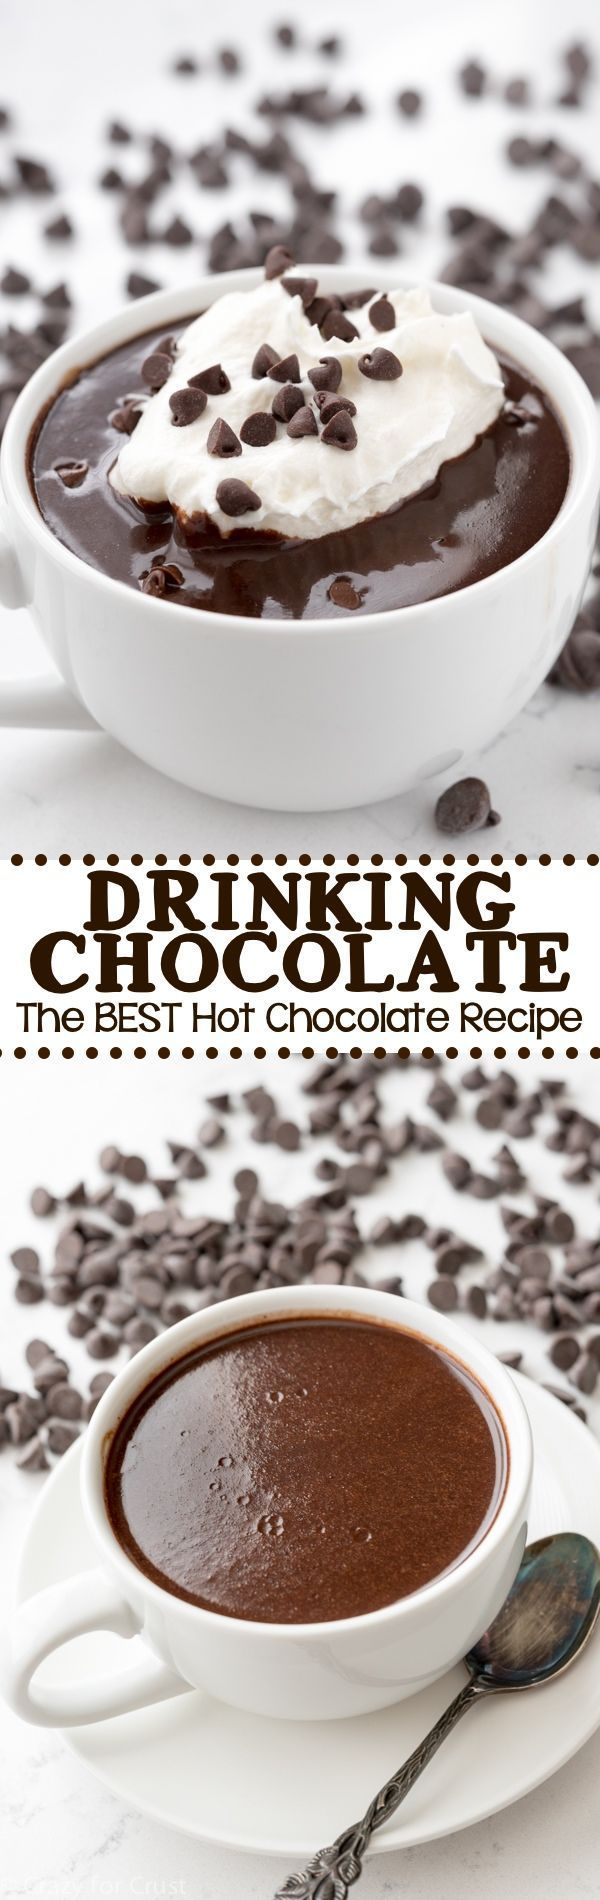 Drinking Chocolate - an easy hot chocolate recipe that tastes like you're drinking liquid ganache!